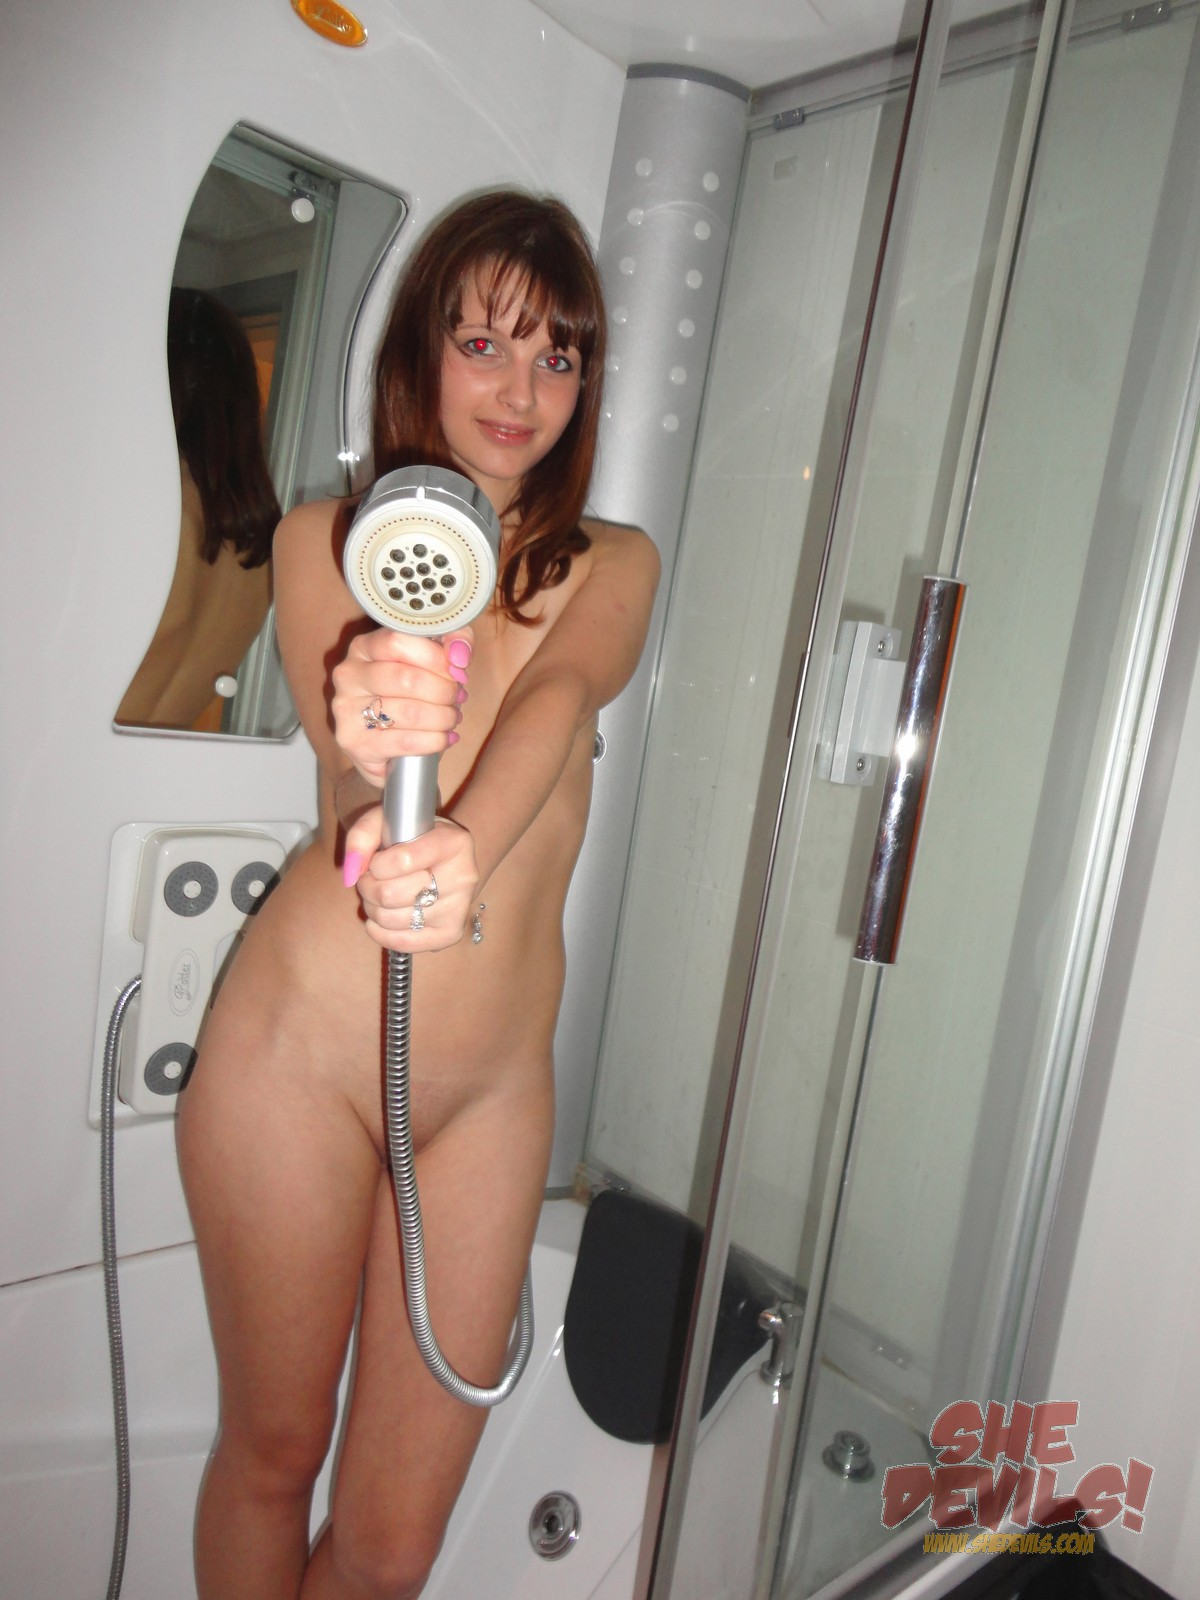 Russian Wifes Jorday Net Russian - Sex Nurse Local